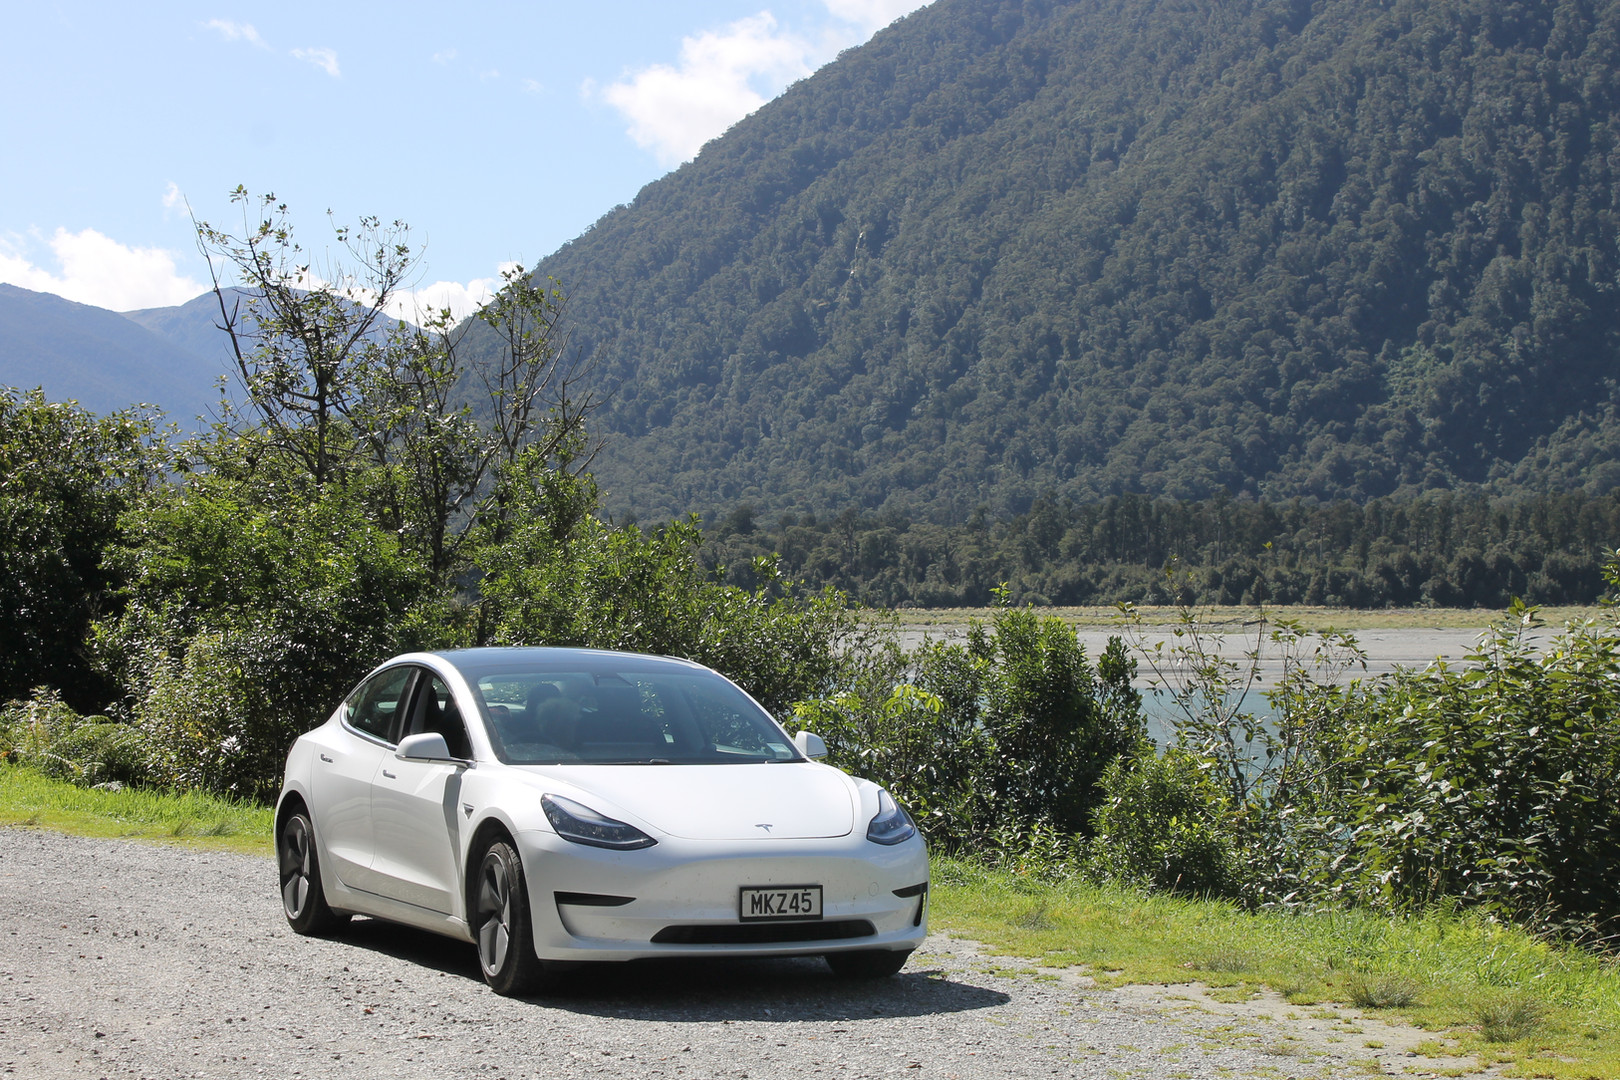 Telsa Model 3 in the wild